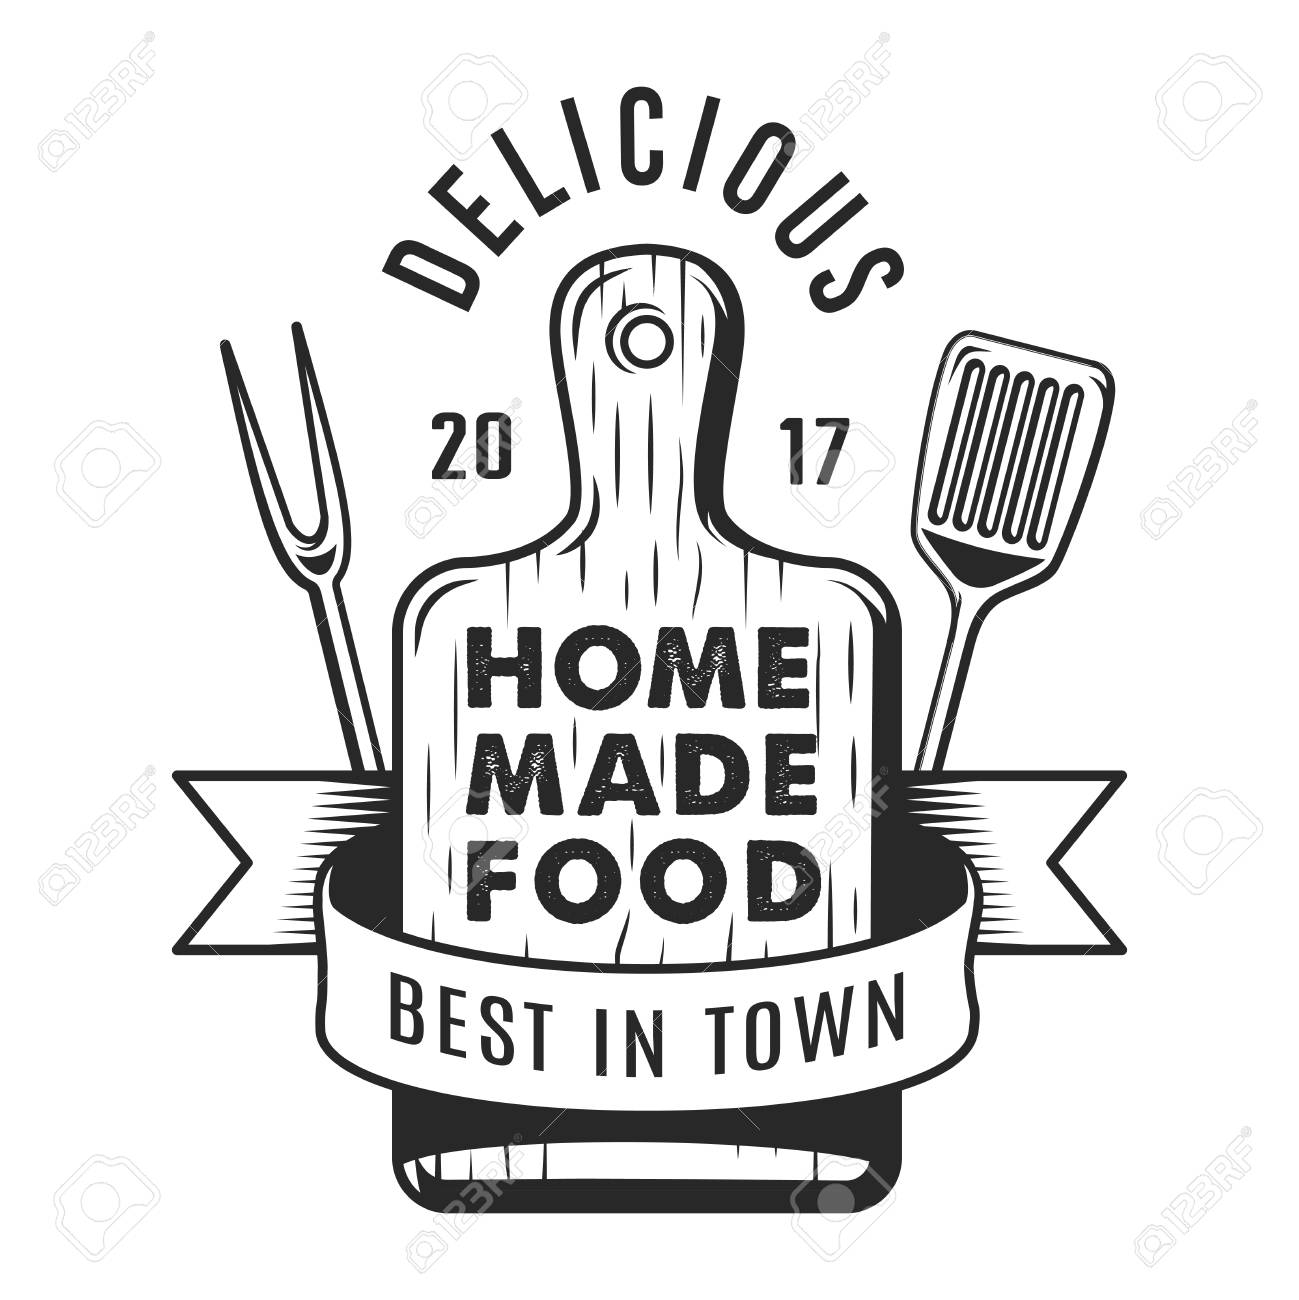 Vintage kitchen utensil monochrome emblem - 105266088